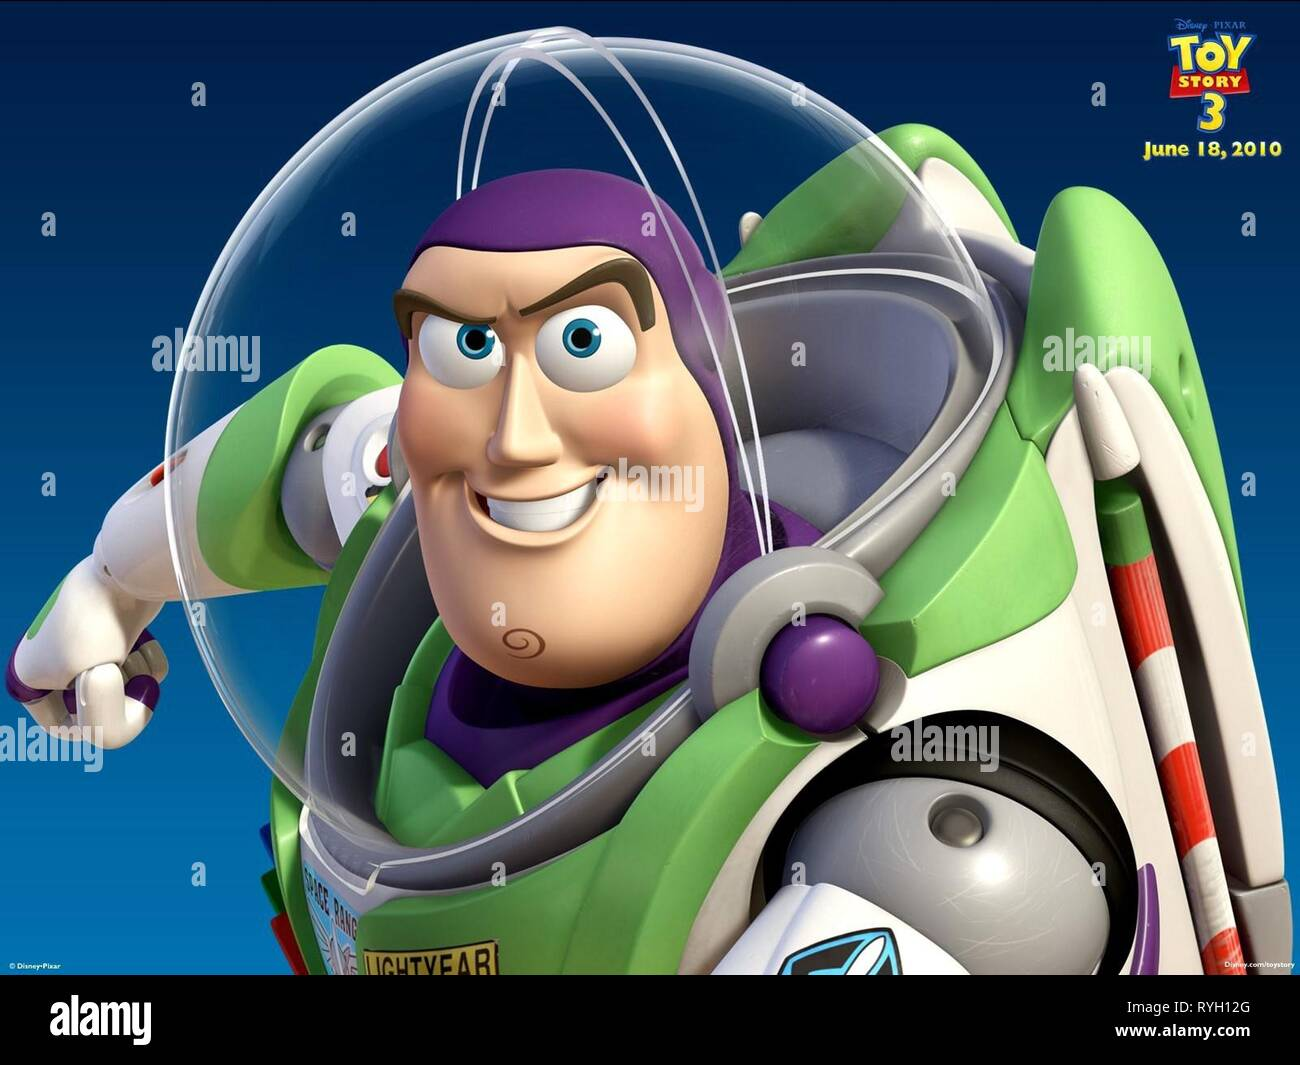 BUZZ LIGHTYEAR, TOY STORY 3, 2010 - Stock Image